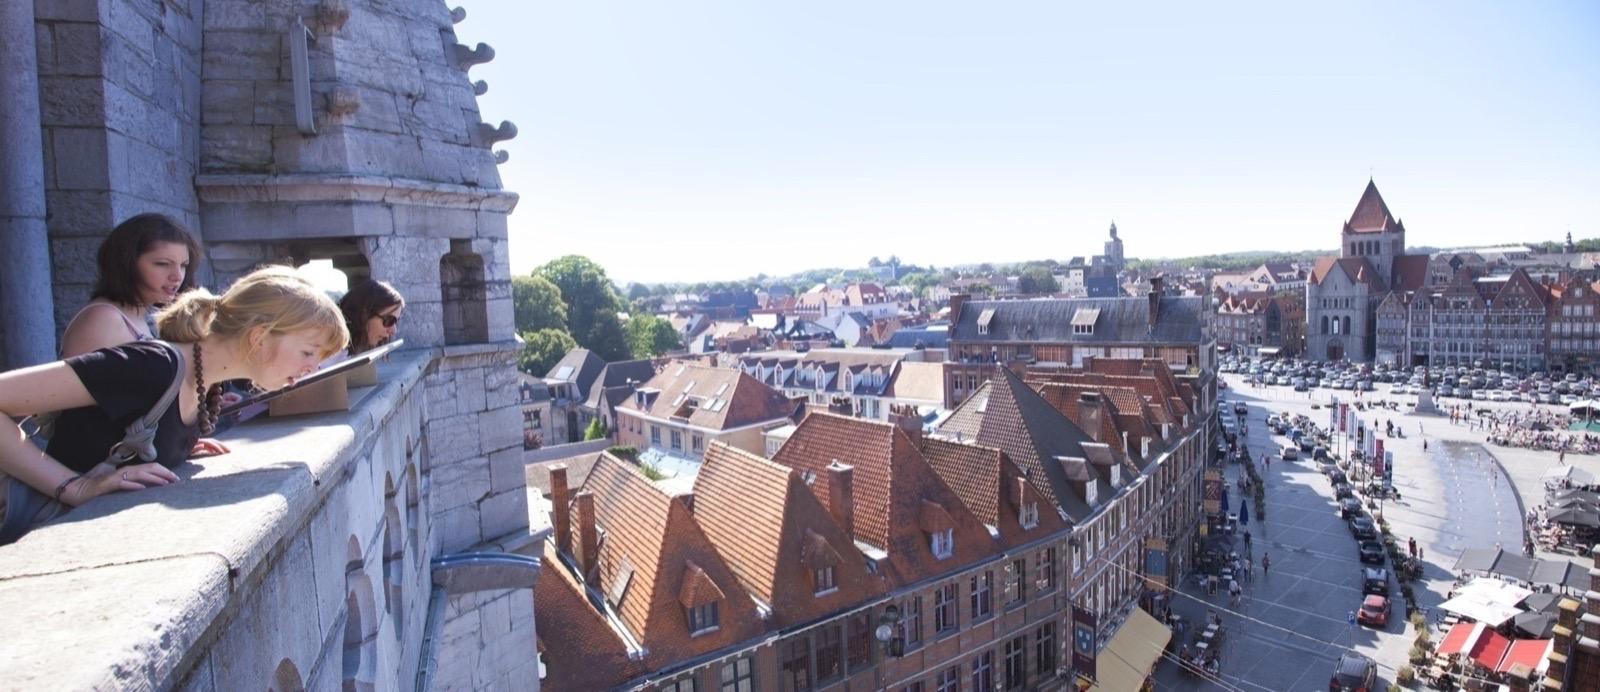 Le Beffroi de Tournai